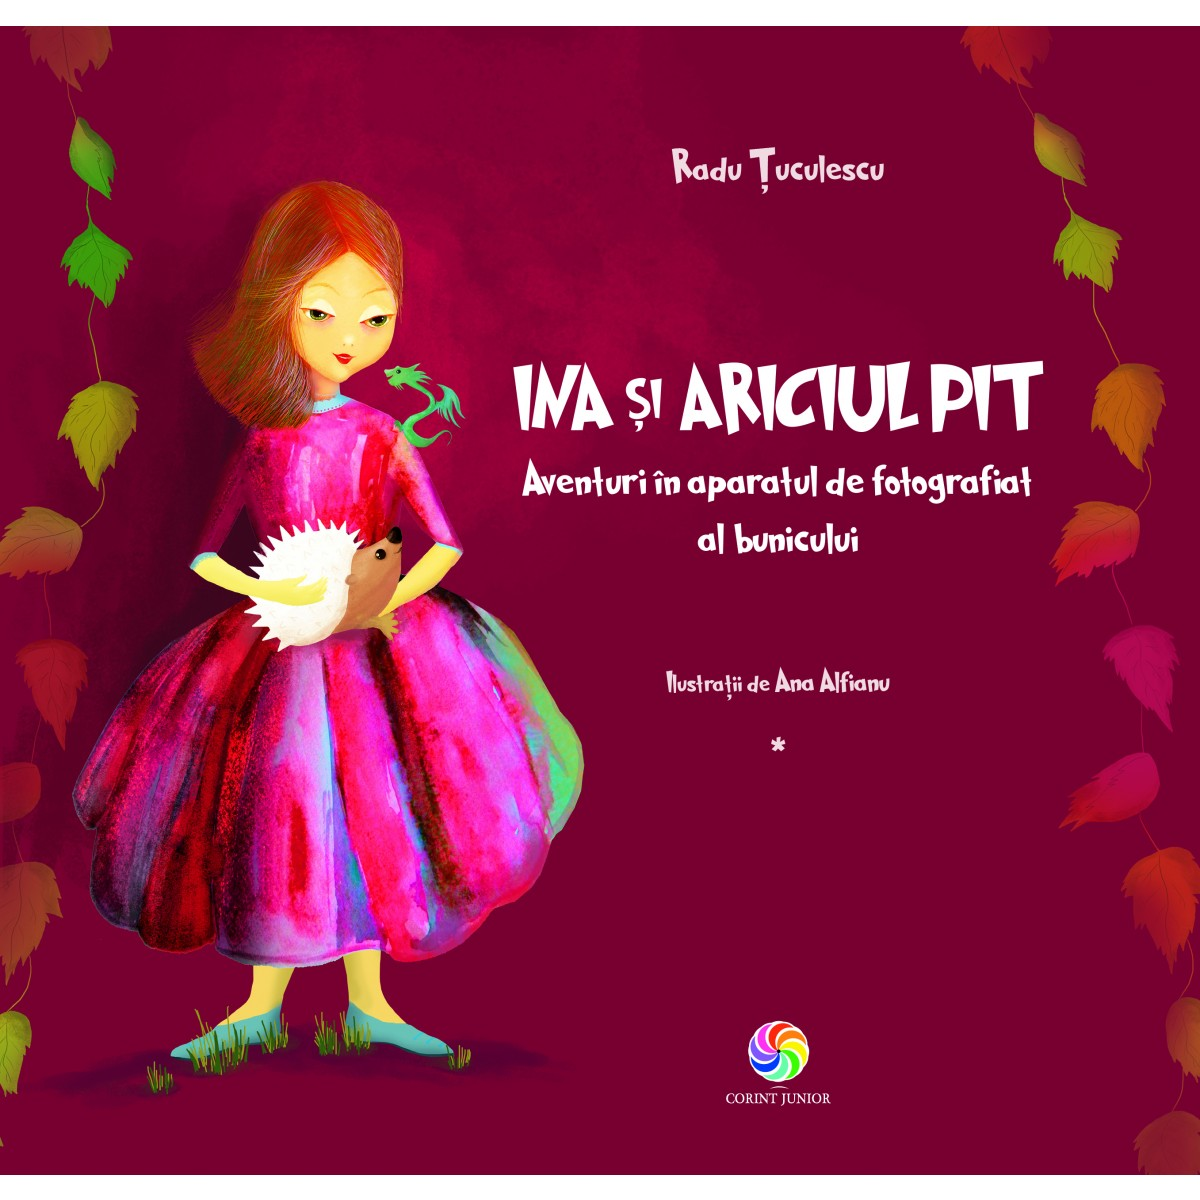 ina_si_ariciul_pit